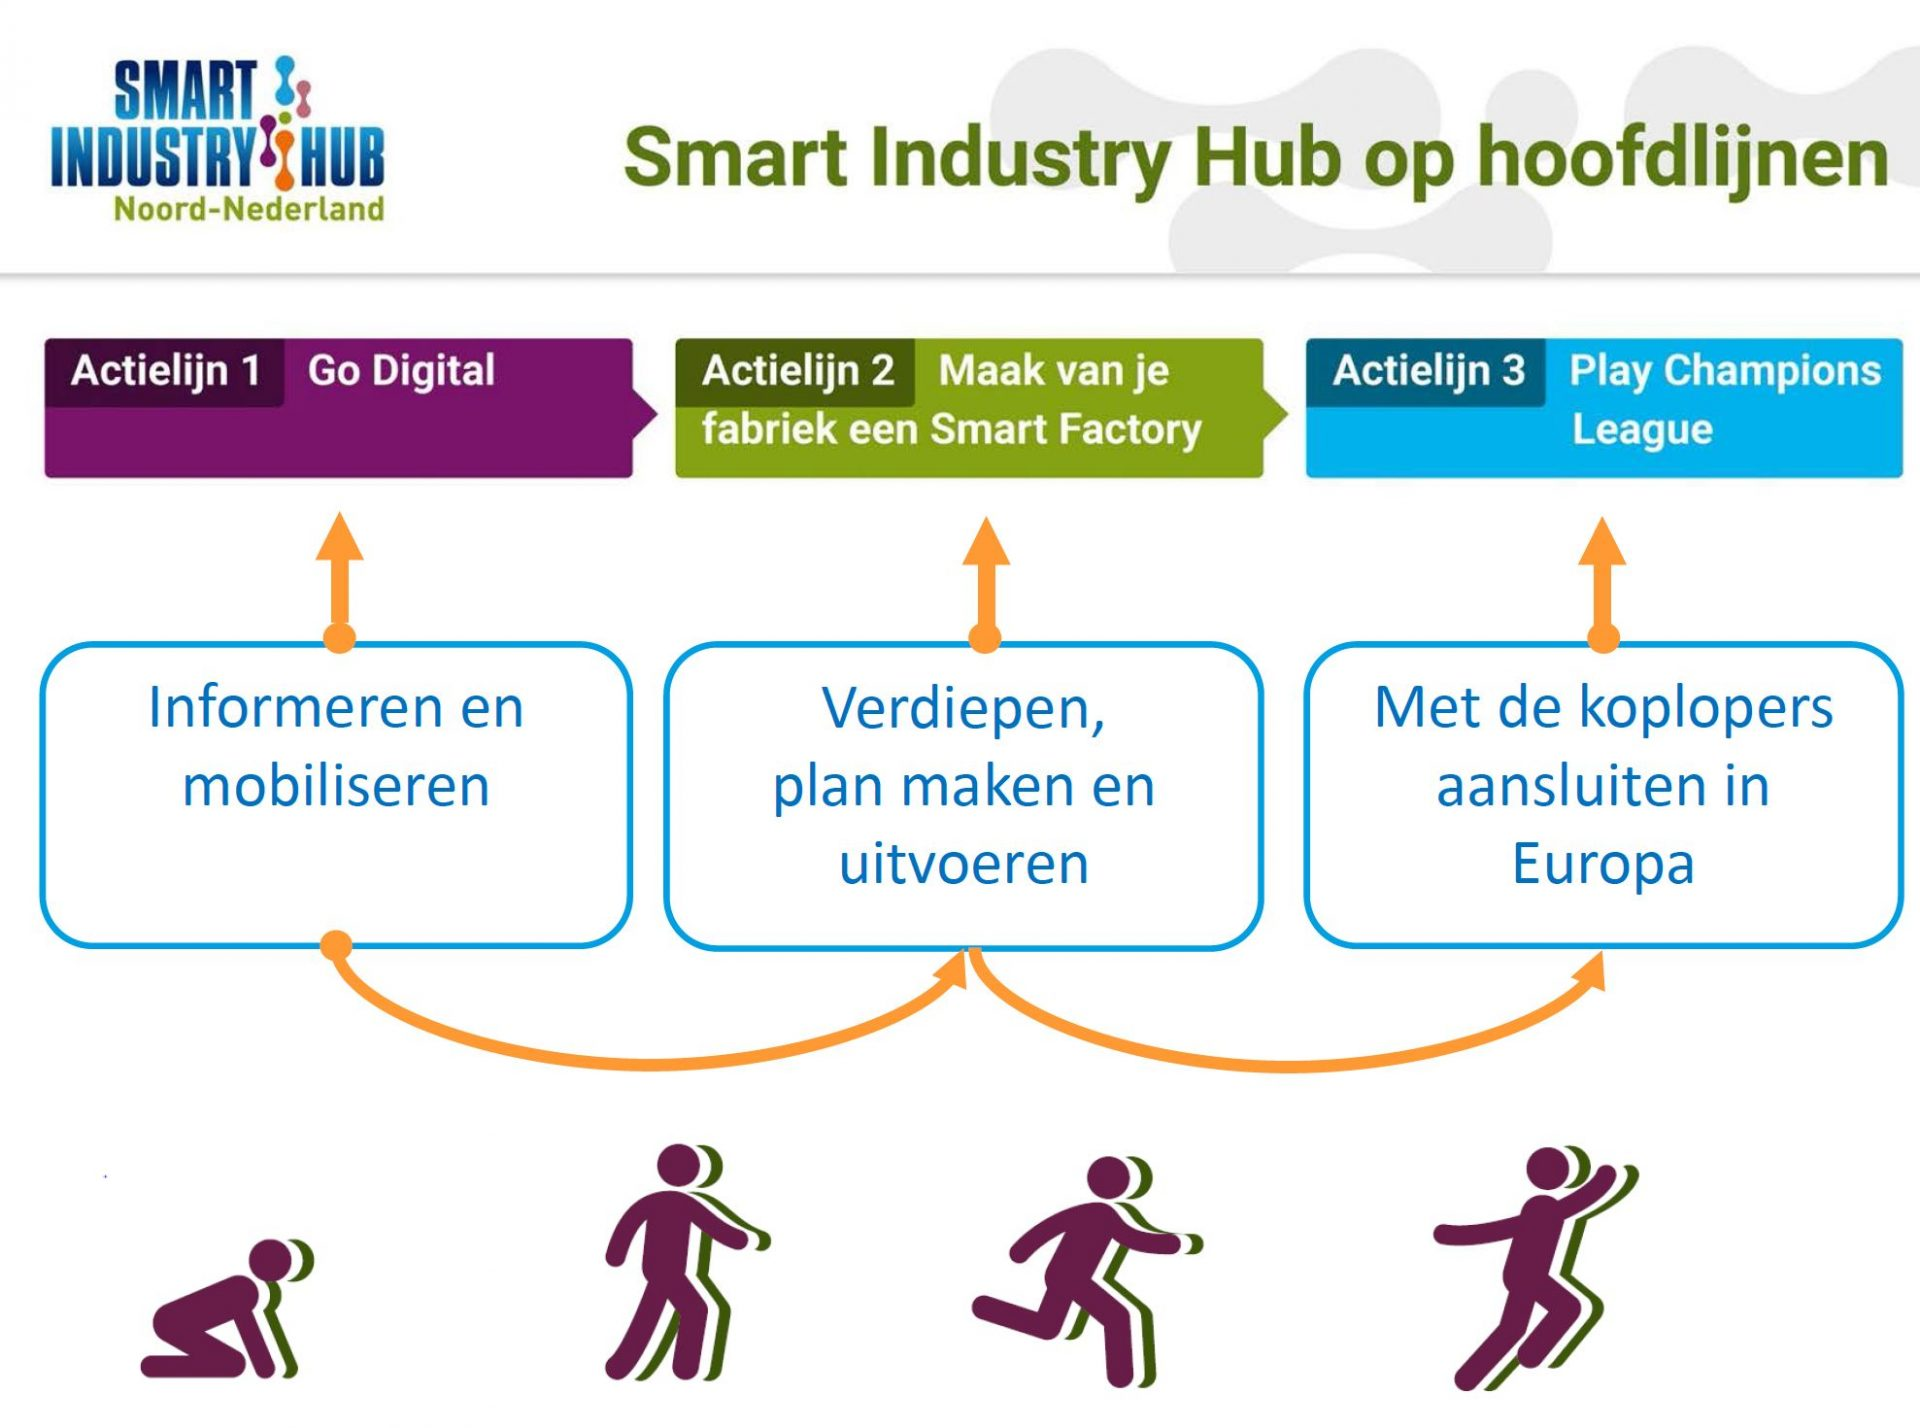 Recordbelangstelling voor opening Smart Industry Hub